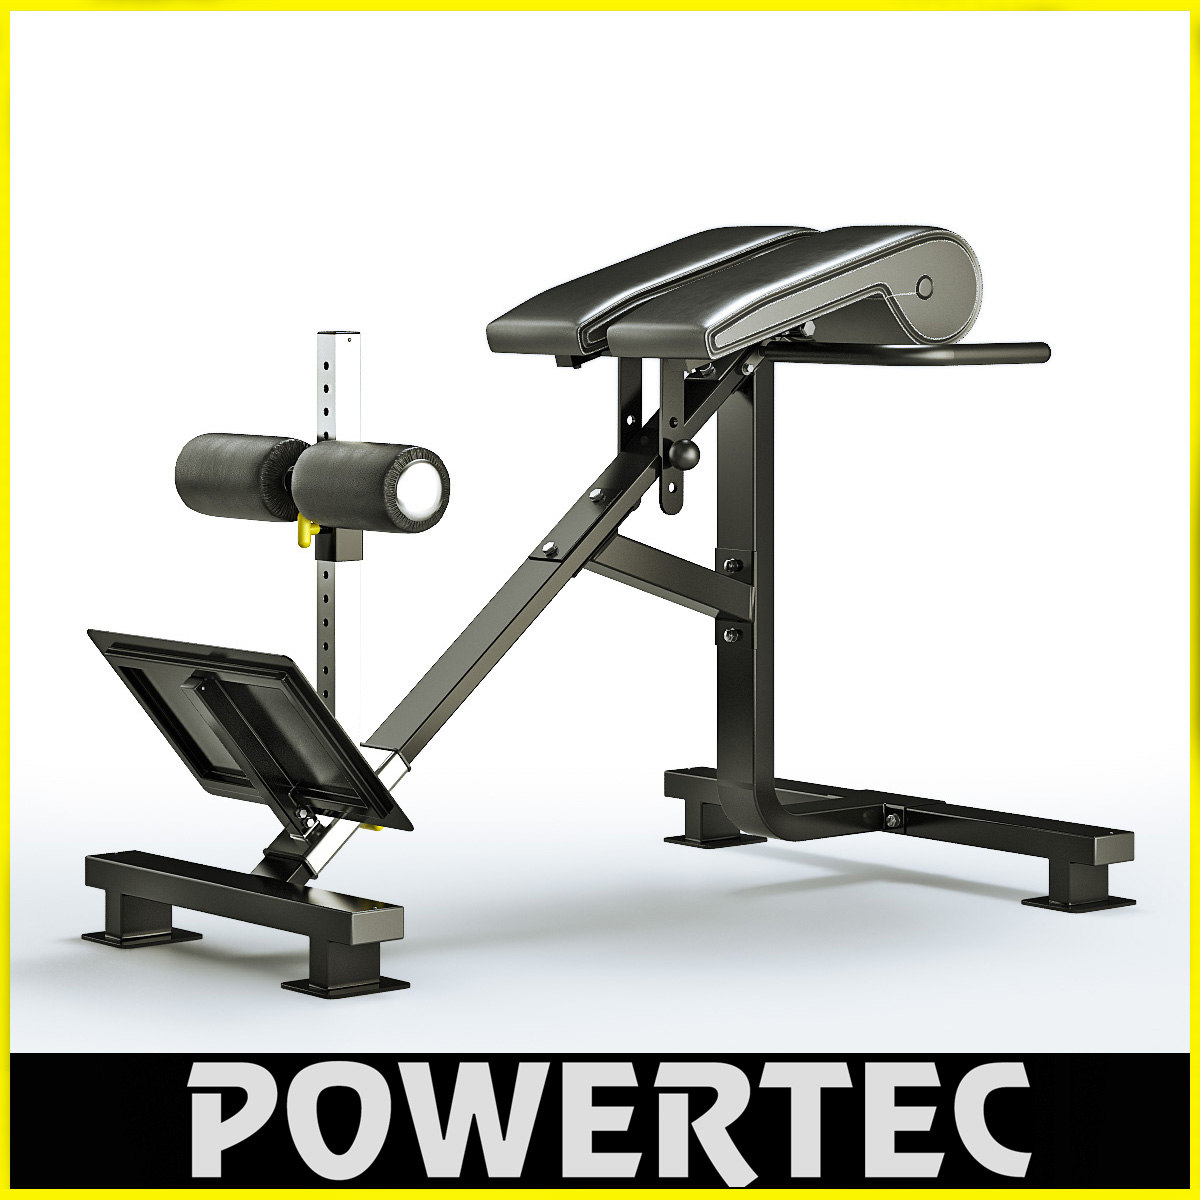 3d model of powertec p-hc10 dual hyperextension